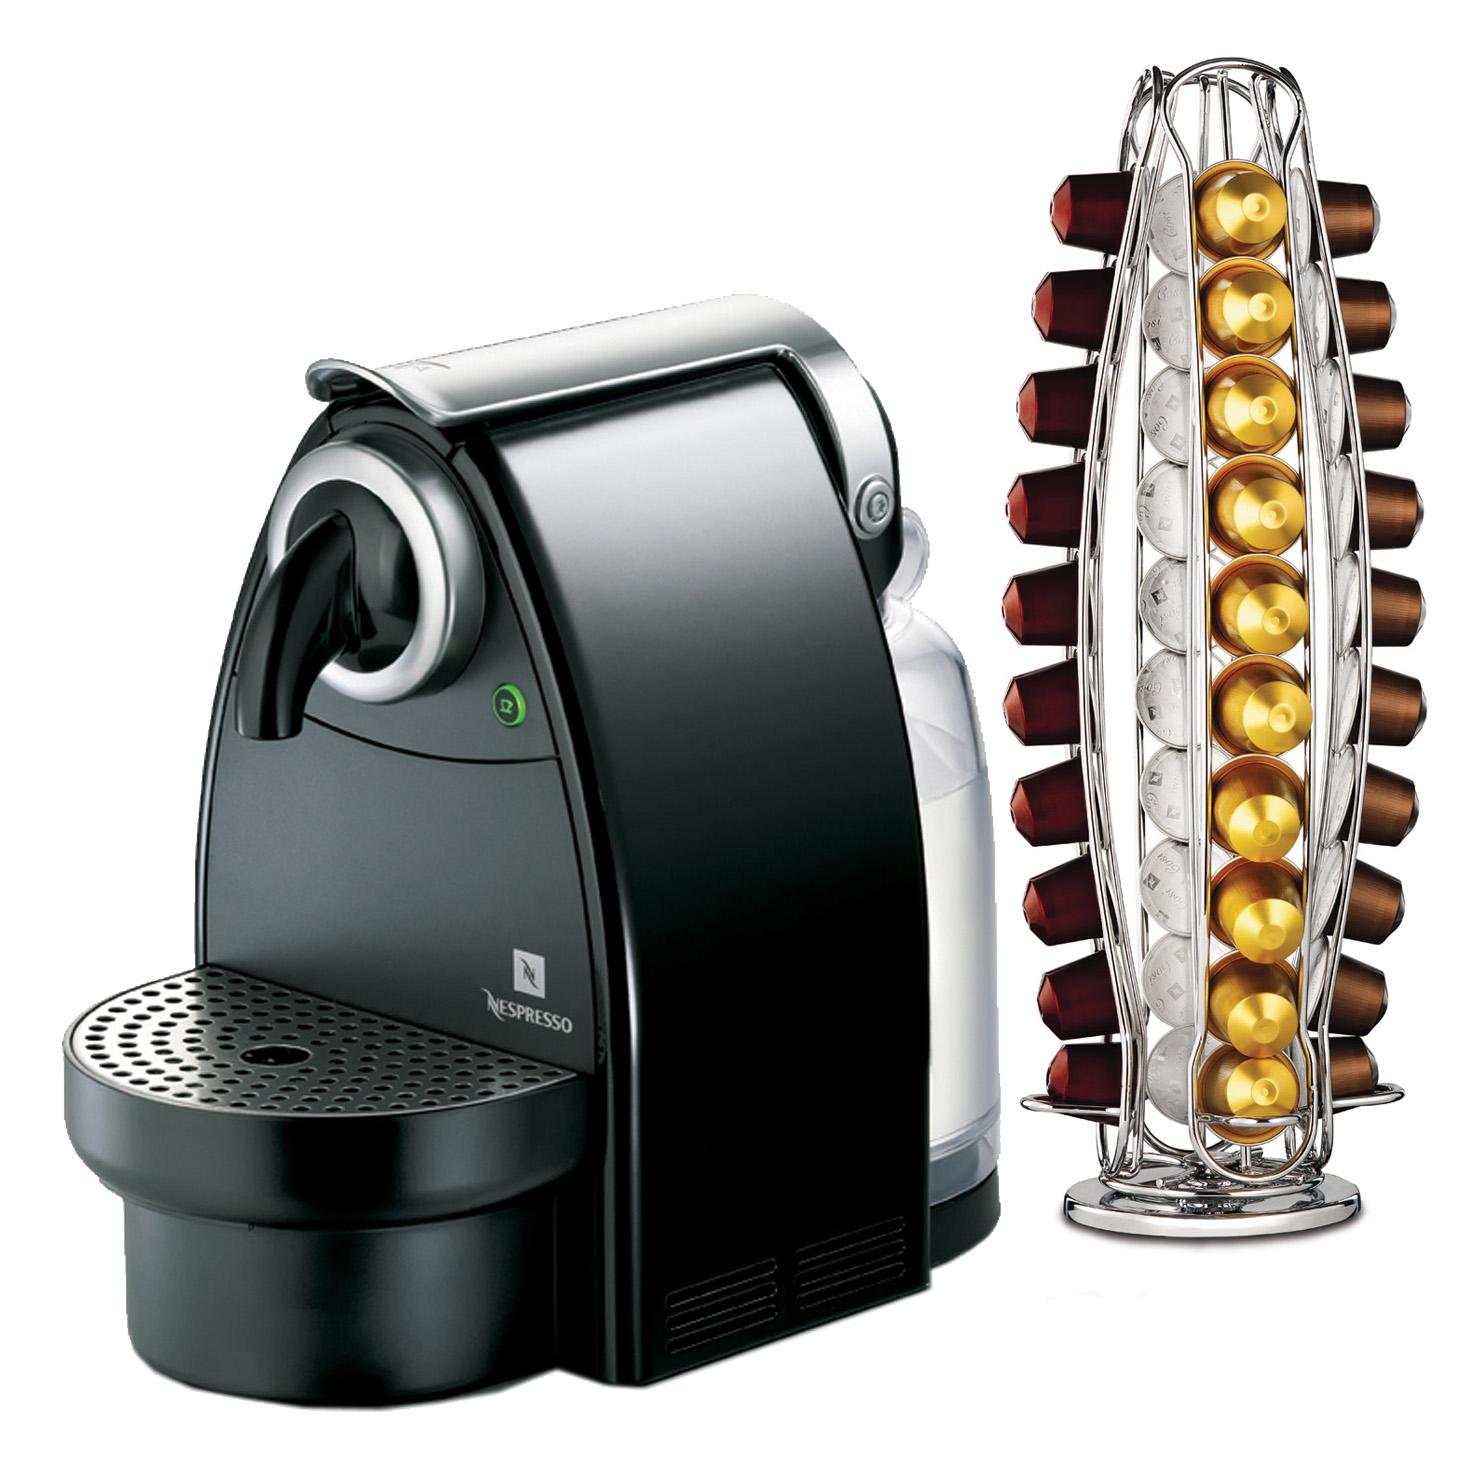 krups nespresso xn212010 essenza automatic espresso coffee. Black Bedroom Furniture Sets. Home Design Ideas